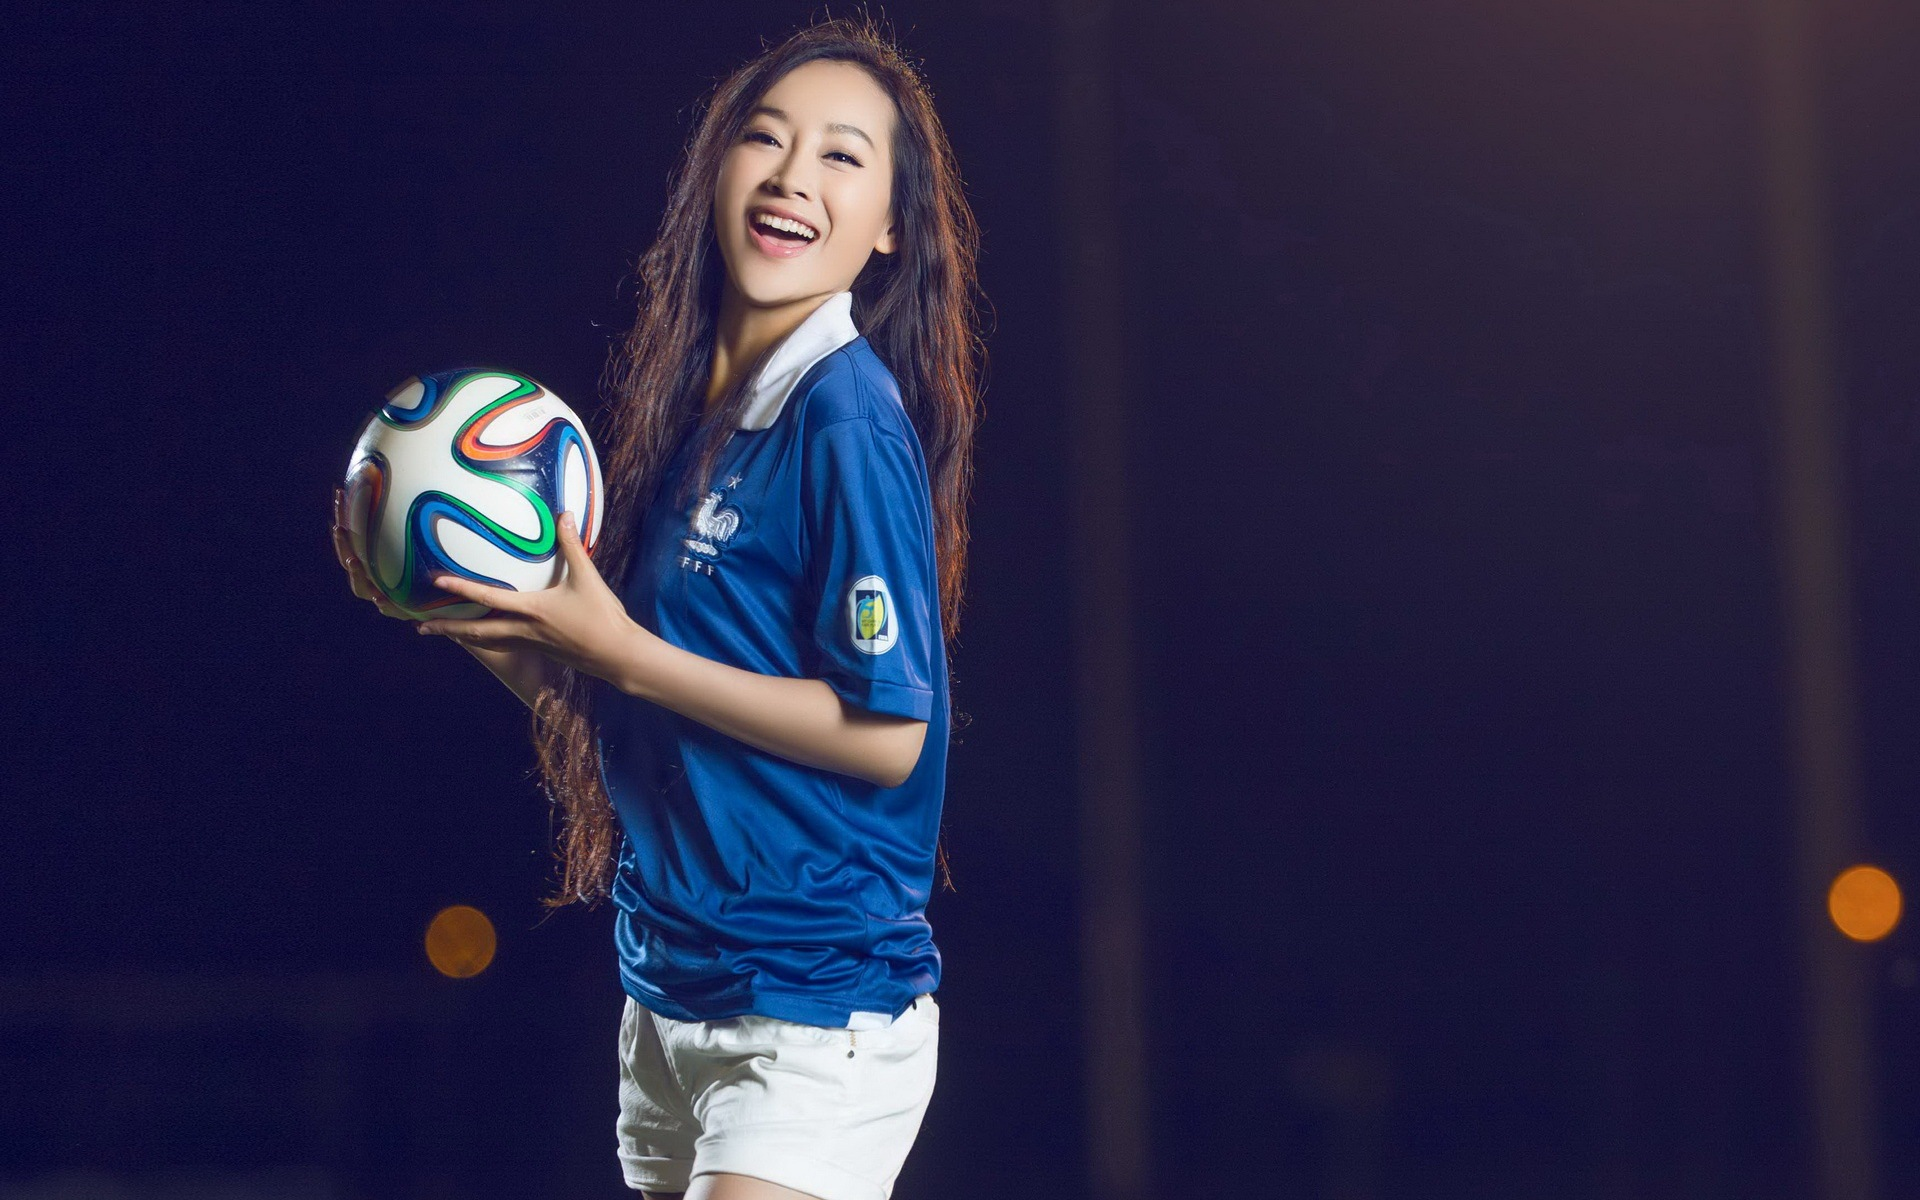 32 World Cup Jerseys Football Baby Beautiful Girls Hd Wallpapers